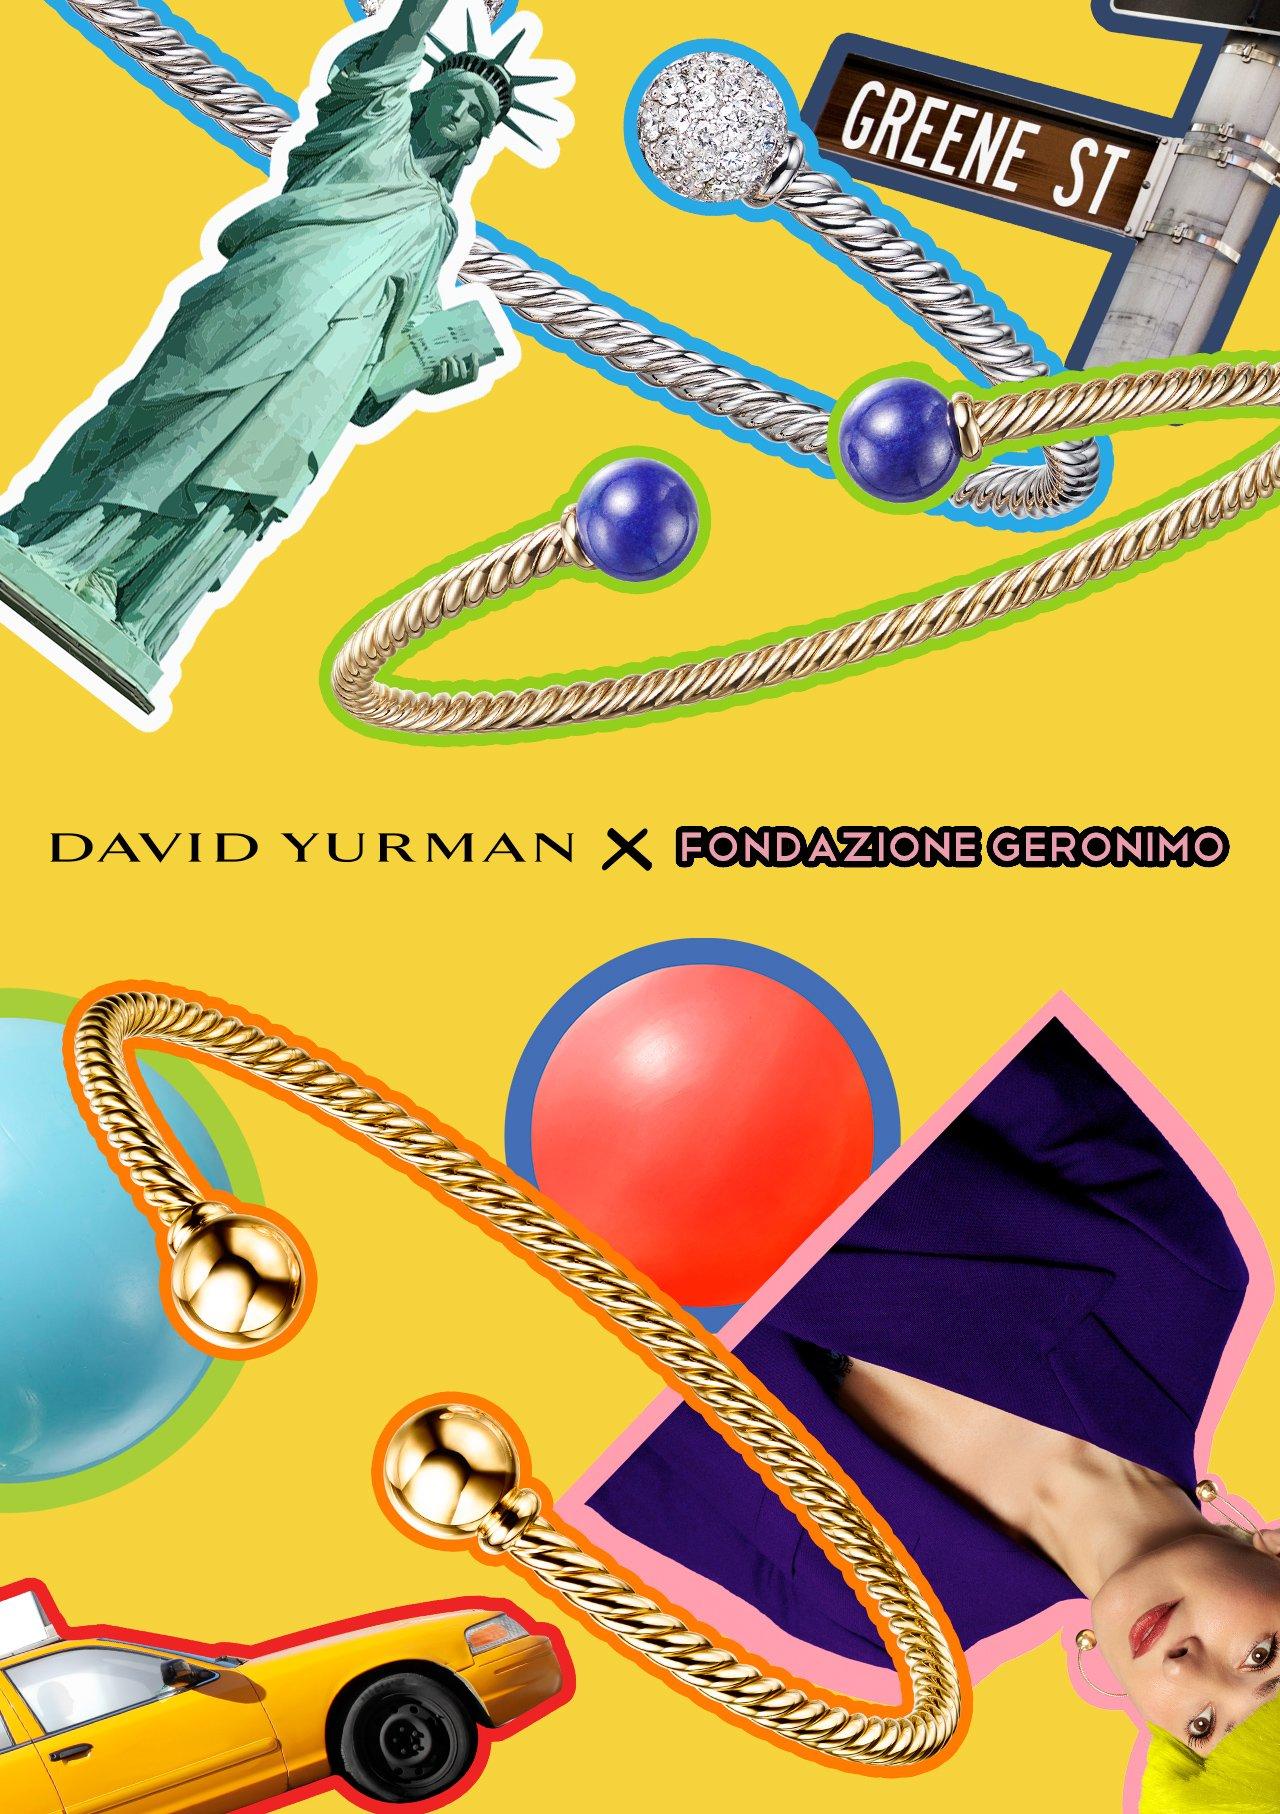 David yurman X Fondazione geronimo